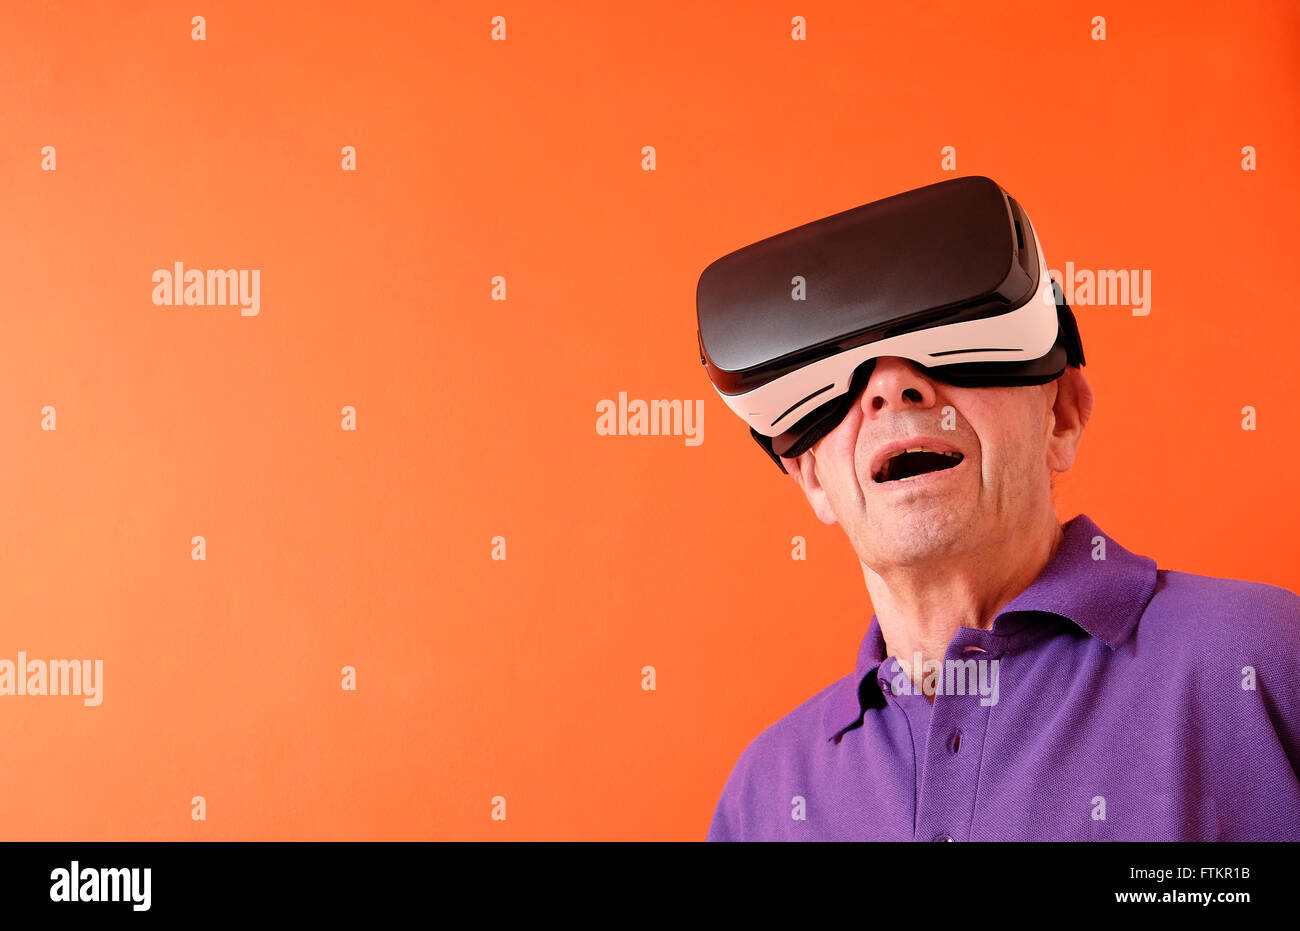 virtual reality headset worn by senior man - Stock Image